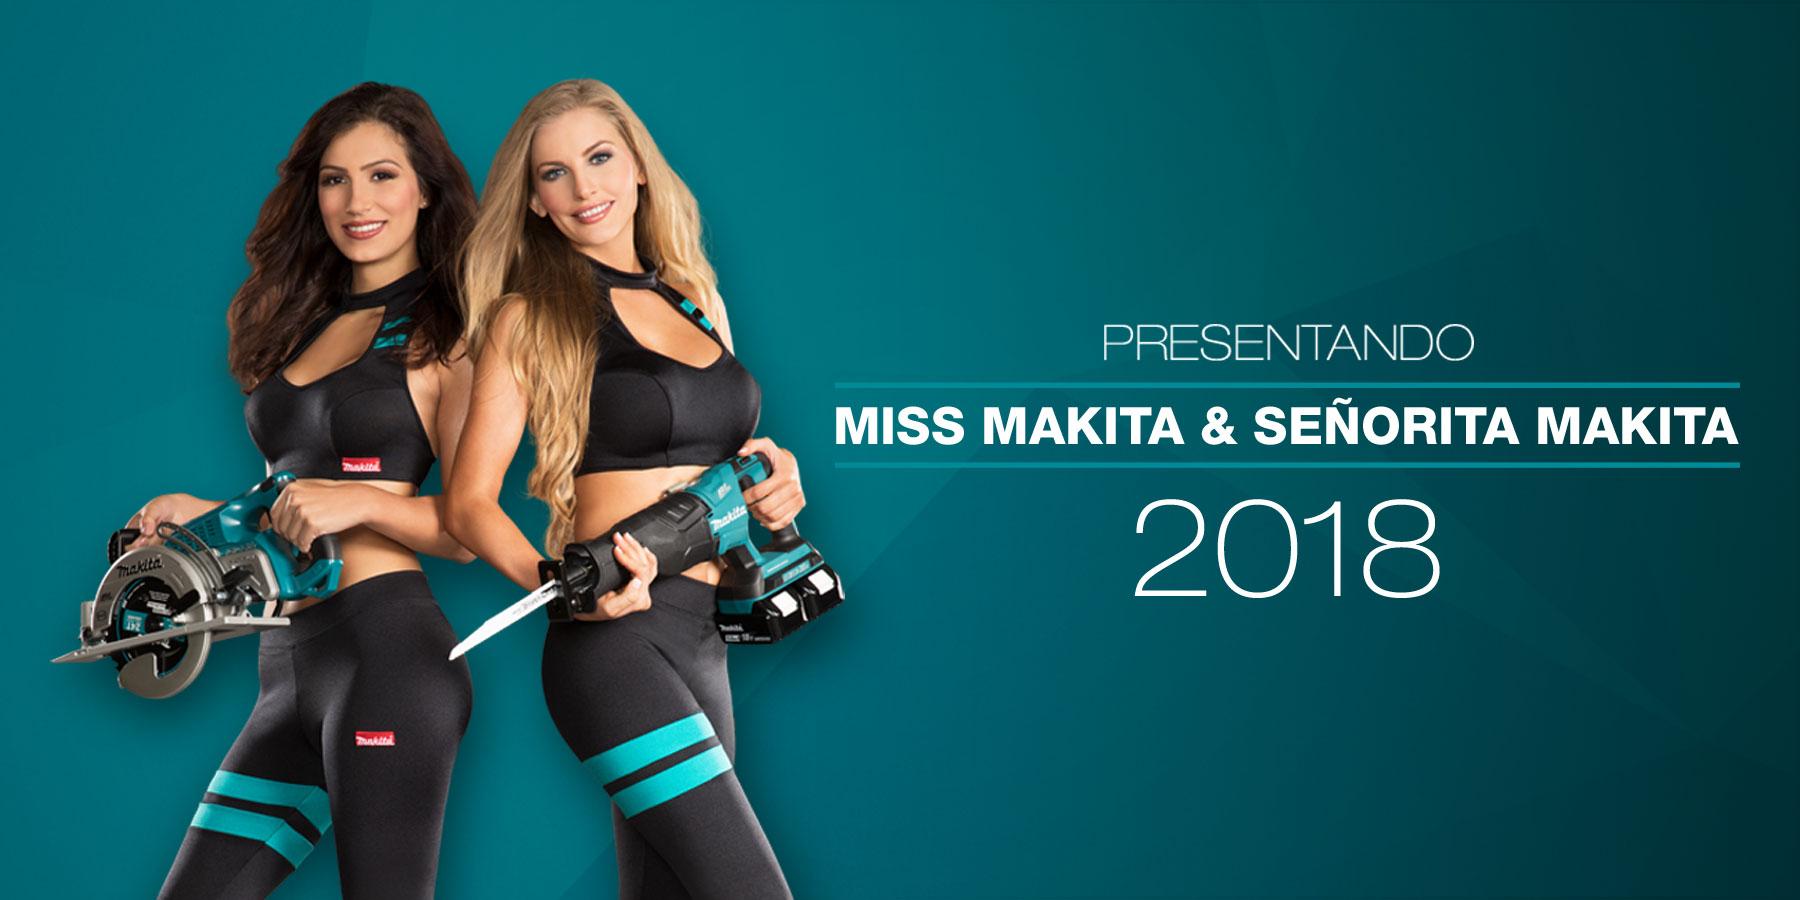 Introducing Miss Makita & Señorita Makita 2017